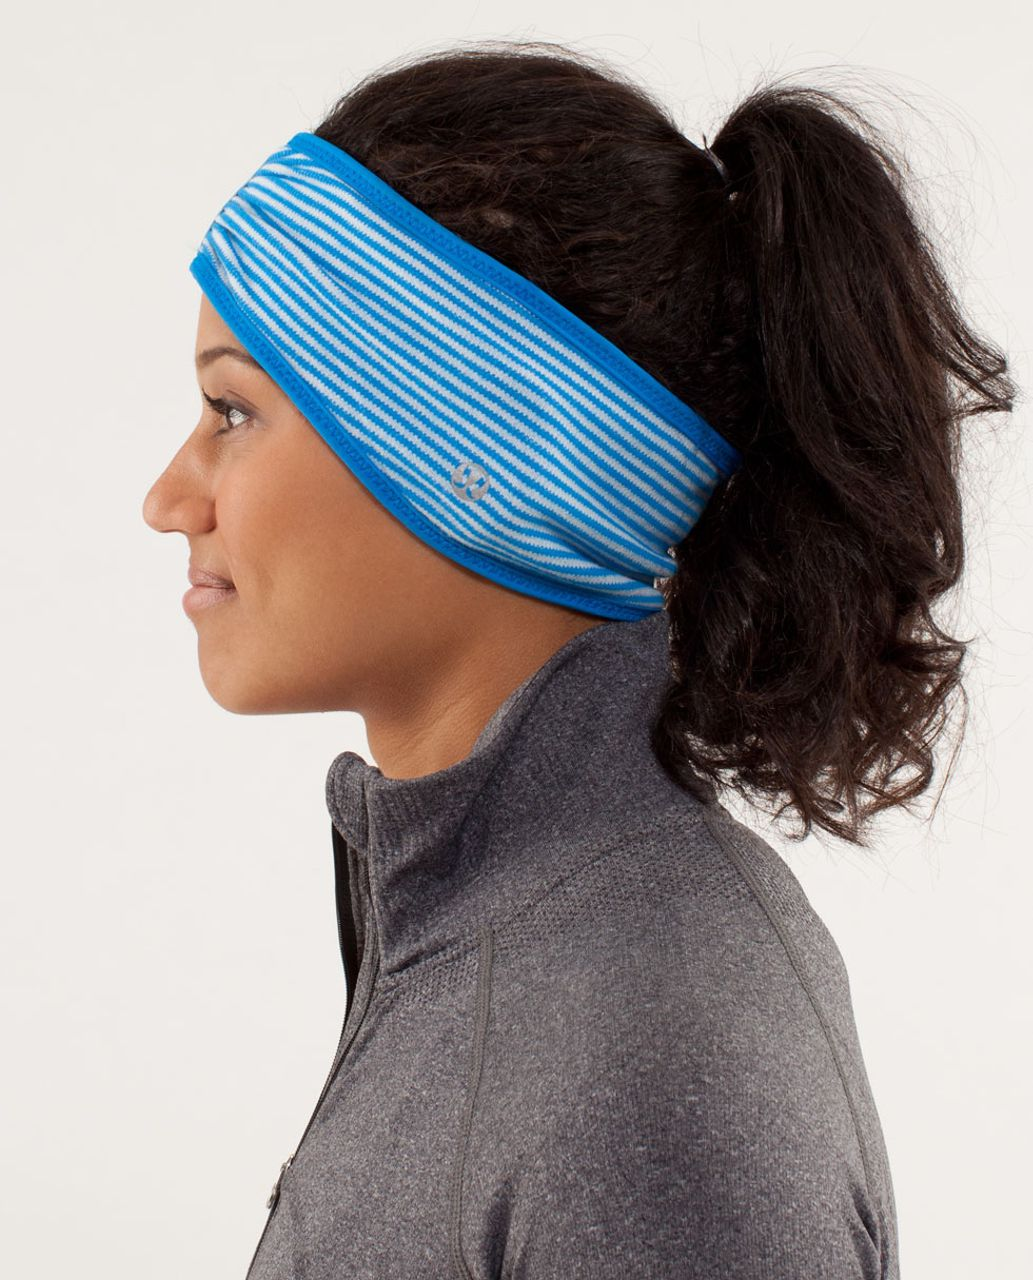 Lululemon Brisk Run Headband - Polar Cream /  Beaming Blue